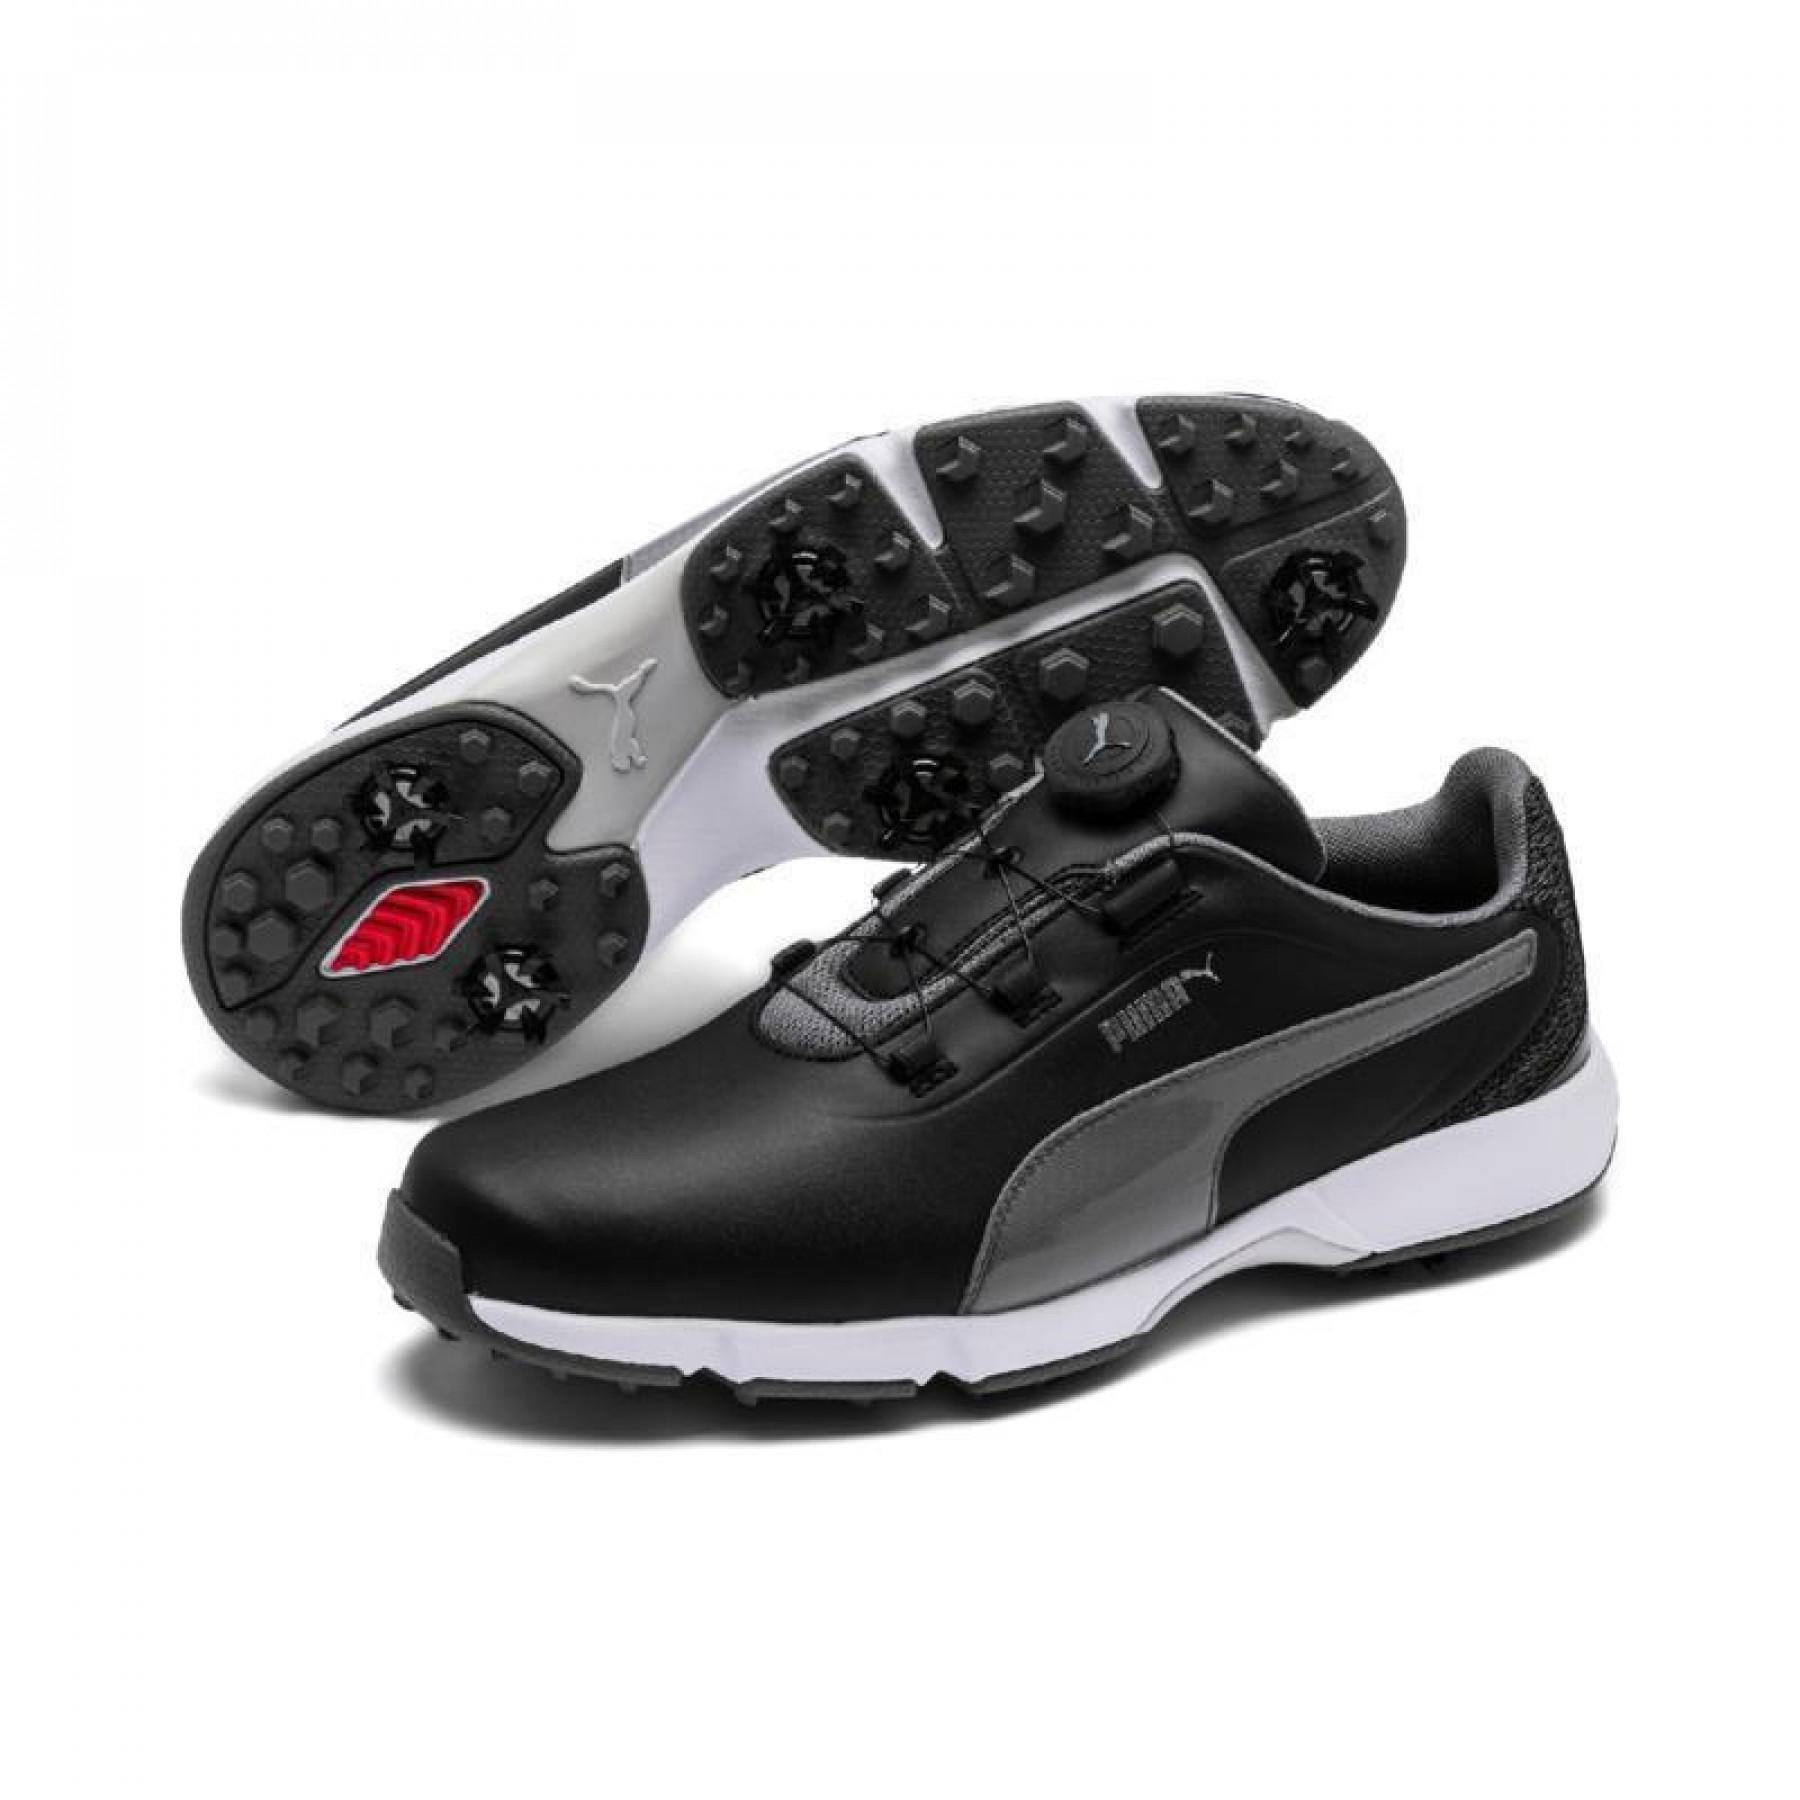 Puma Shoes drive disc